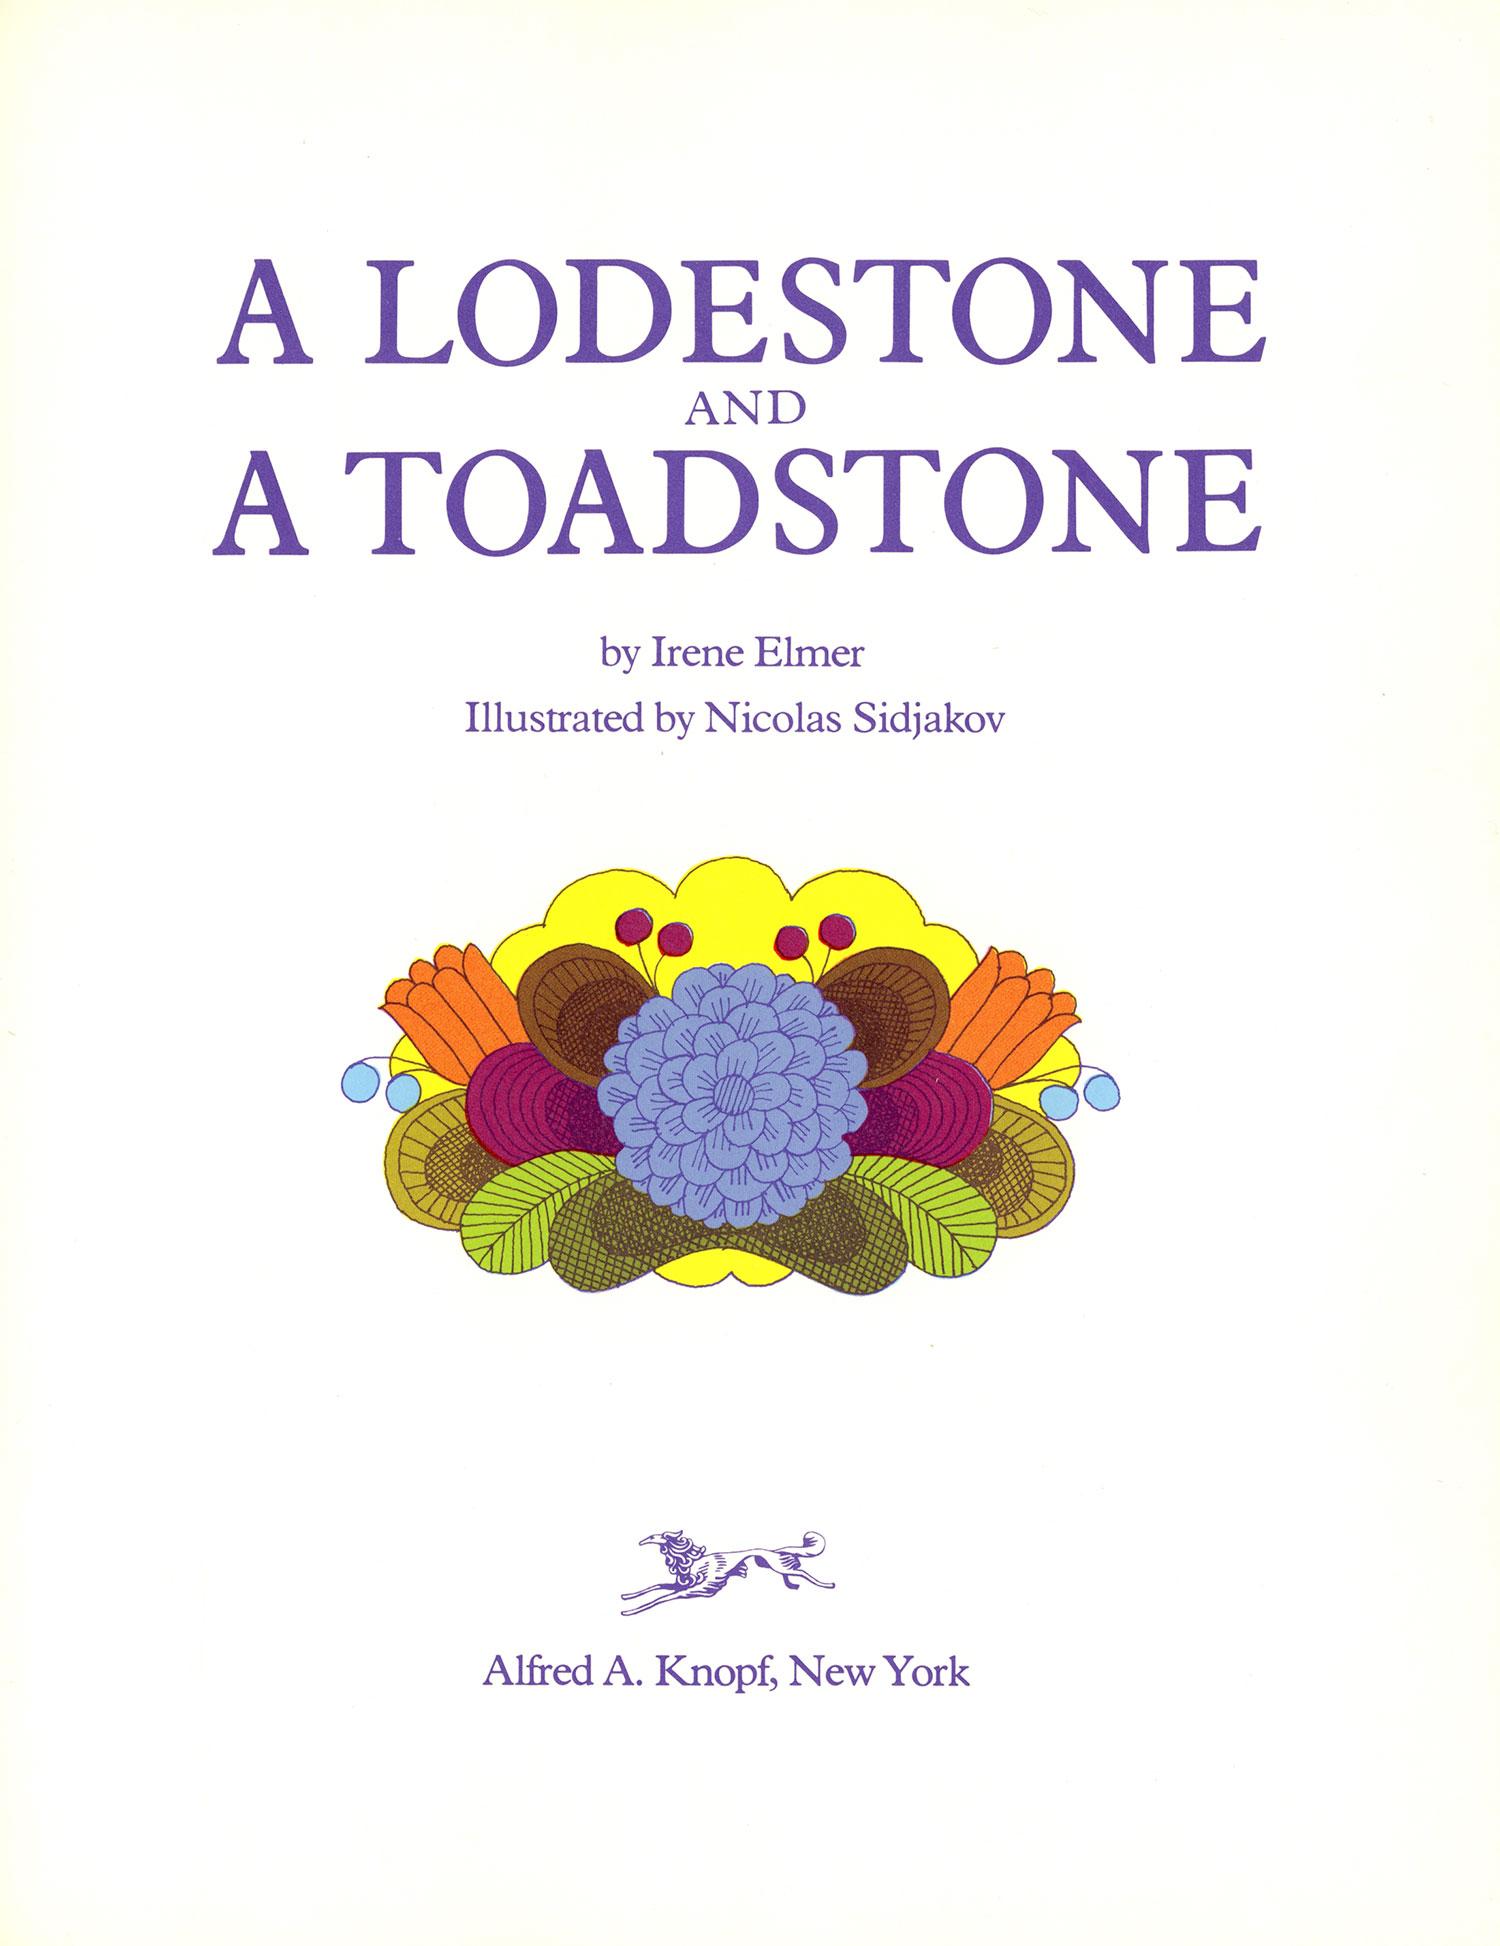 lodestone-page-1.jpg